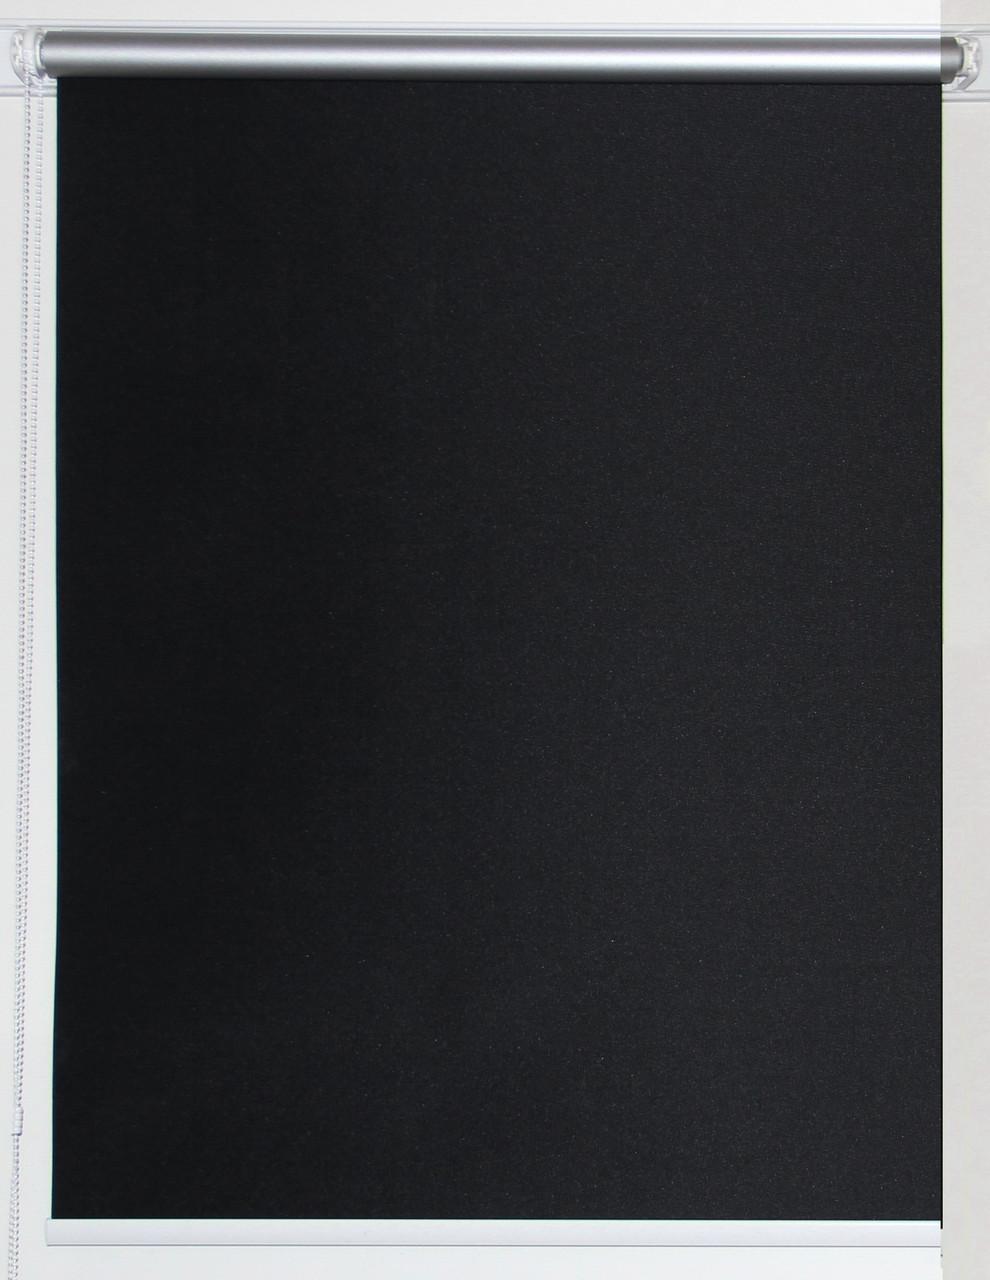 Рулонная штора 650*1500 Блэкаут Сильвер Чёрный